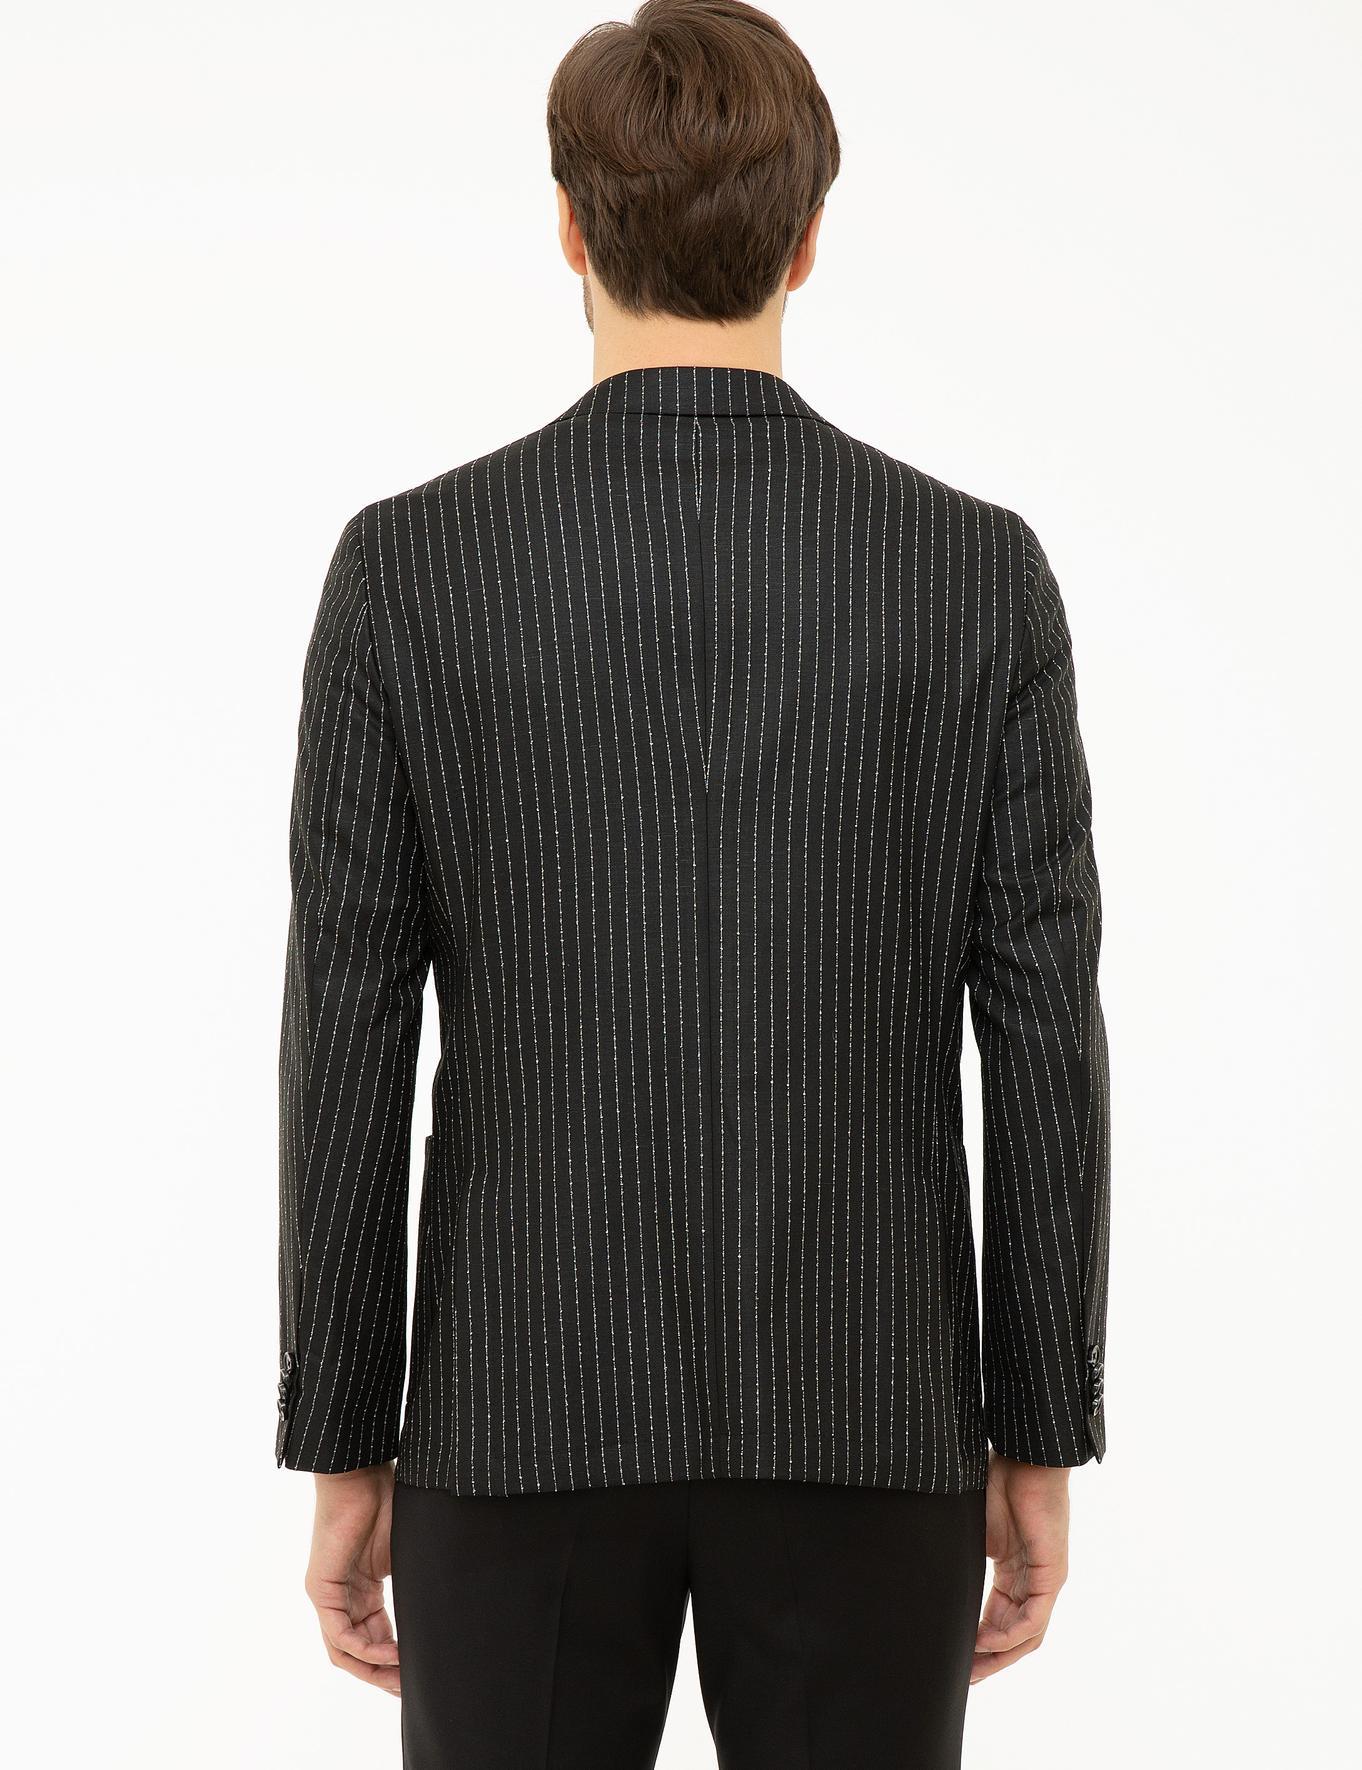 Siyah Slim Fit Ceket - 50223286004